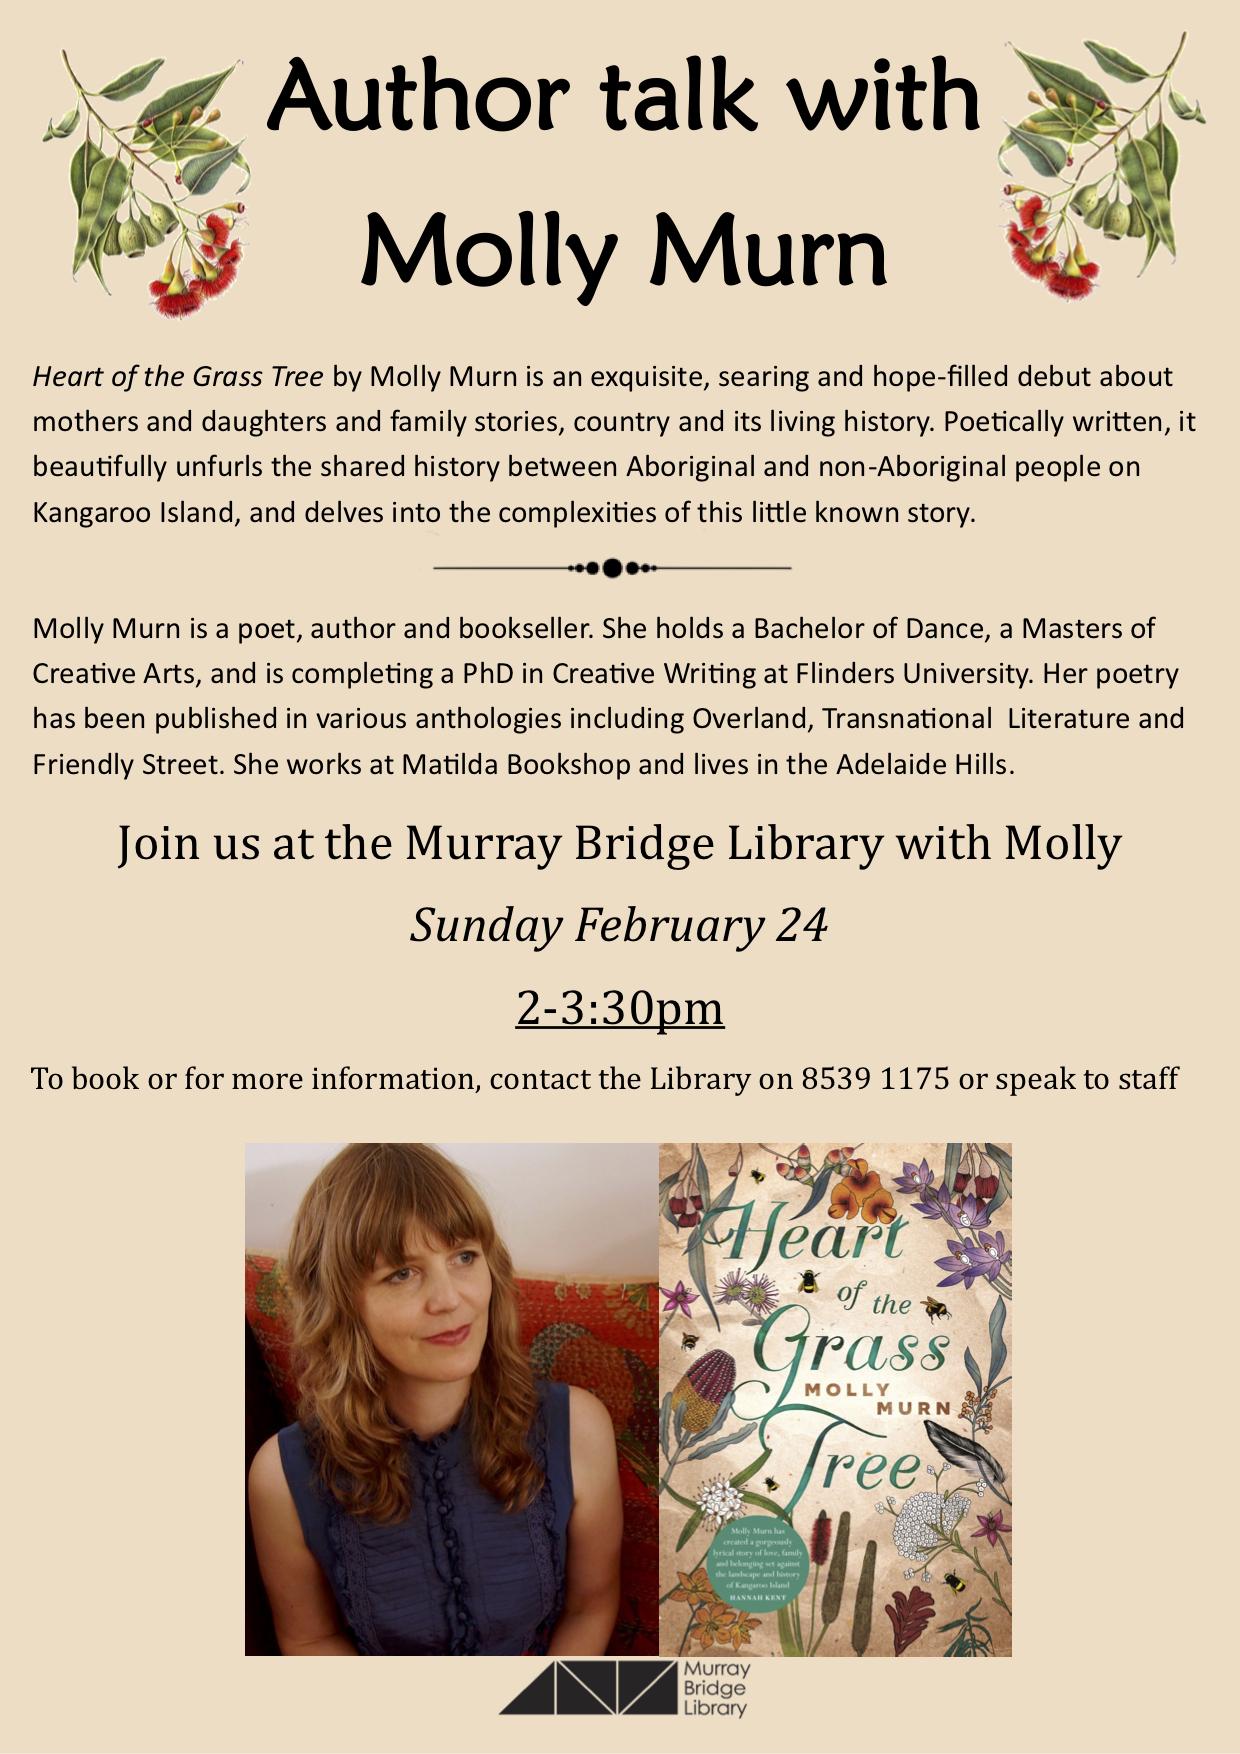 Molly Murn